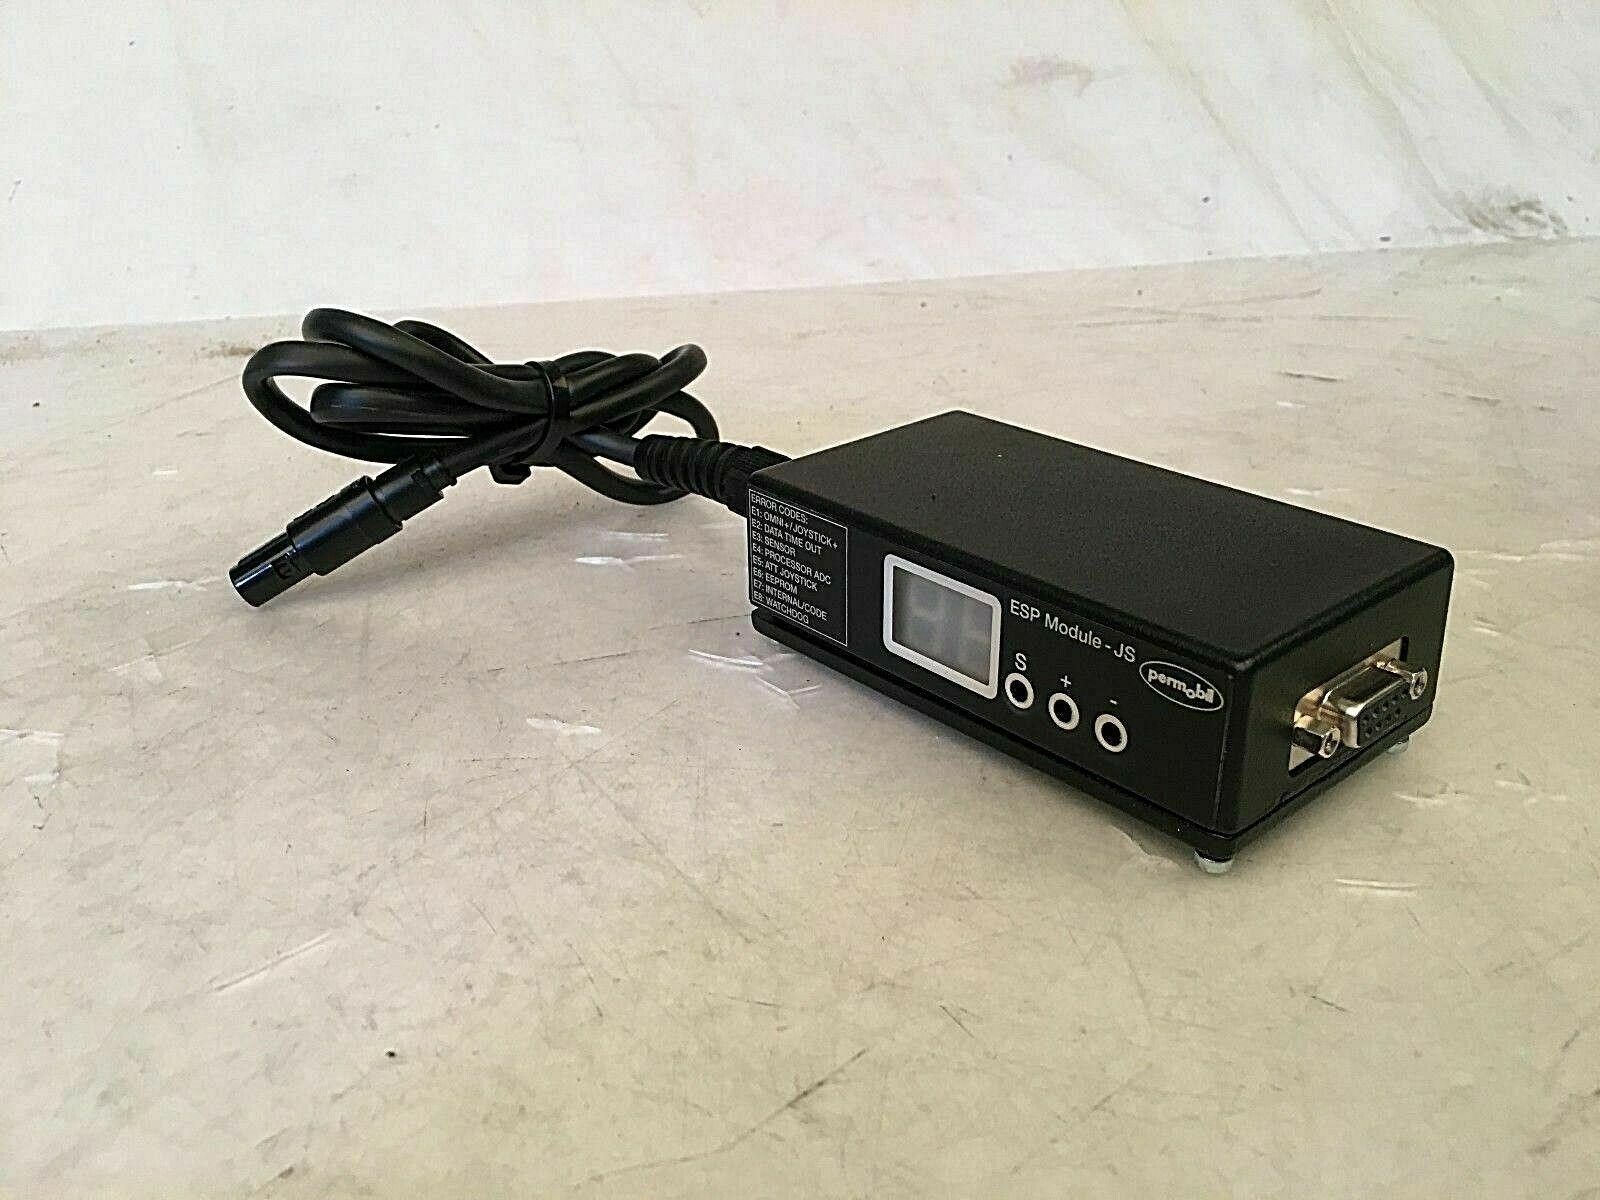 Permobil C500 -  ESP Module-JS - Error Code Reader - For Power Wheelchairs